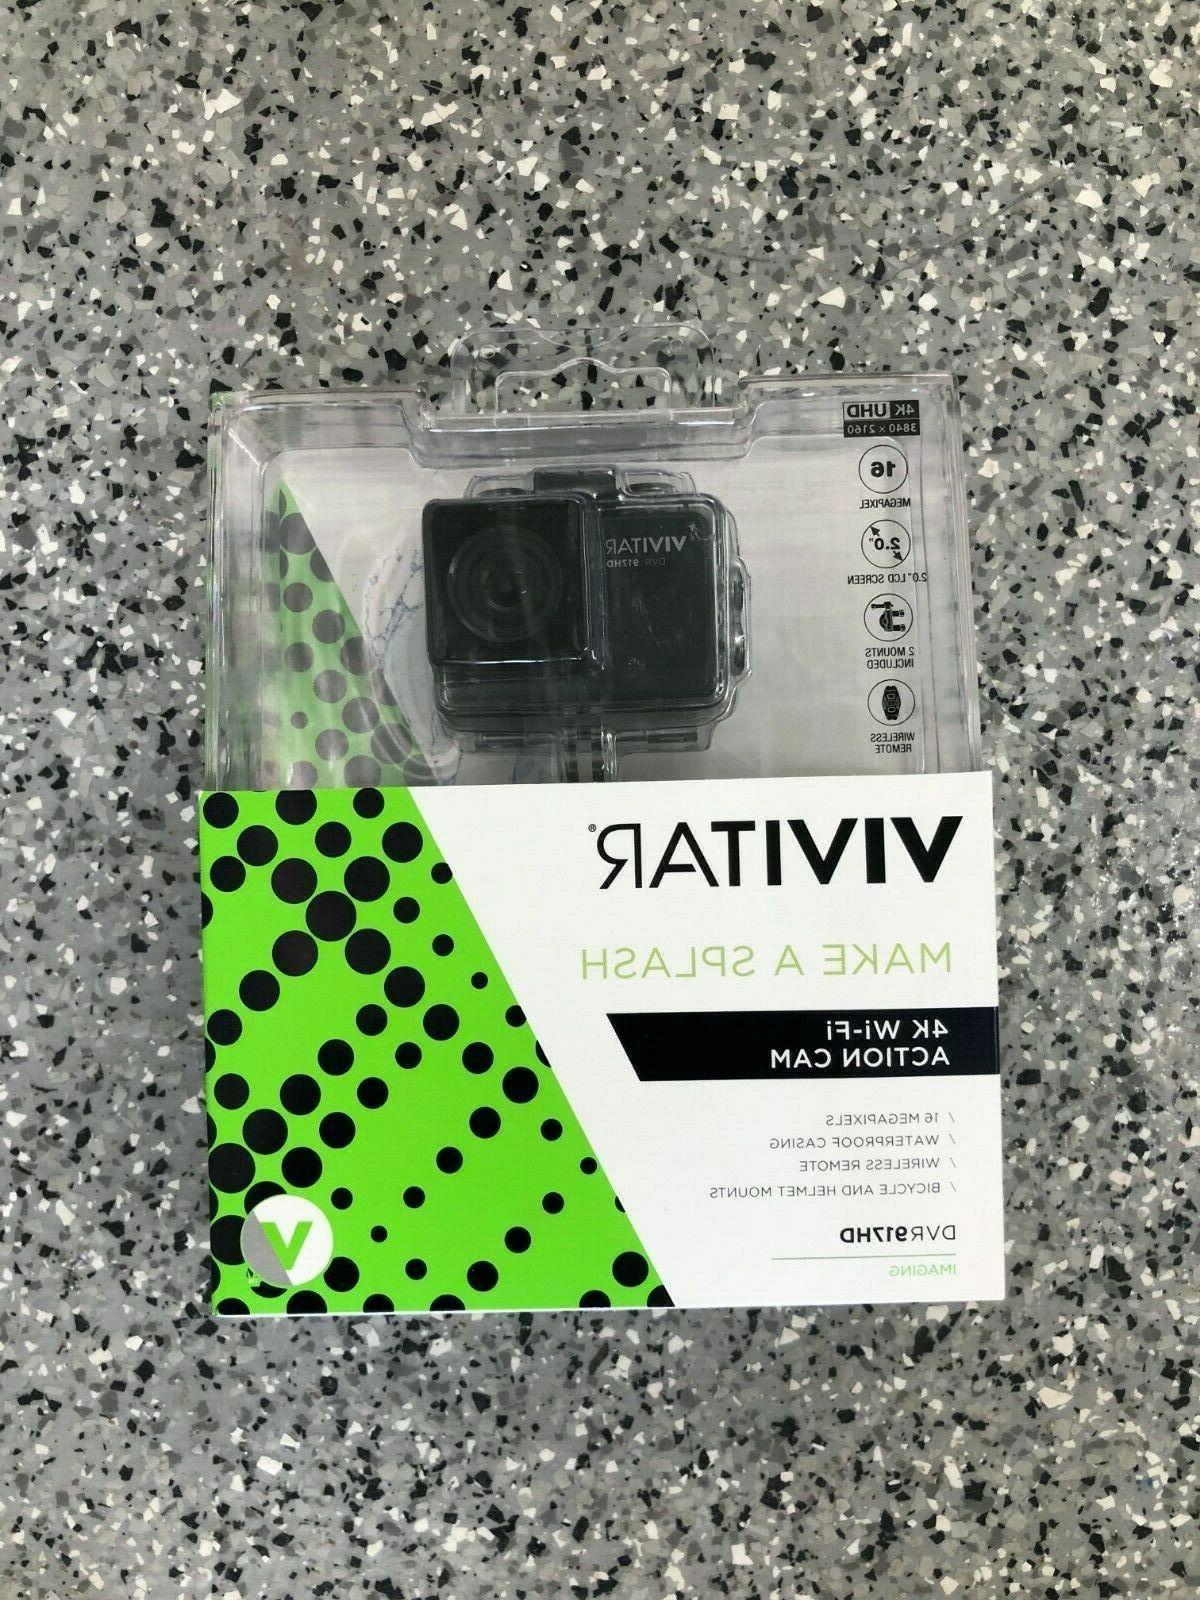 dvr917hd 4k action camera with remote black